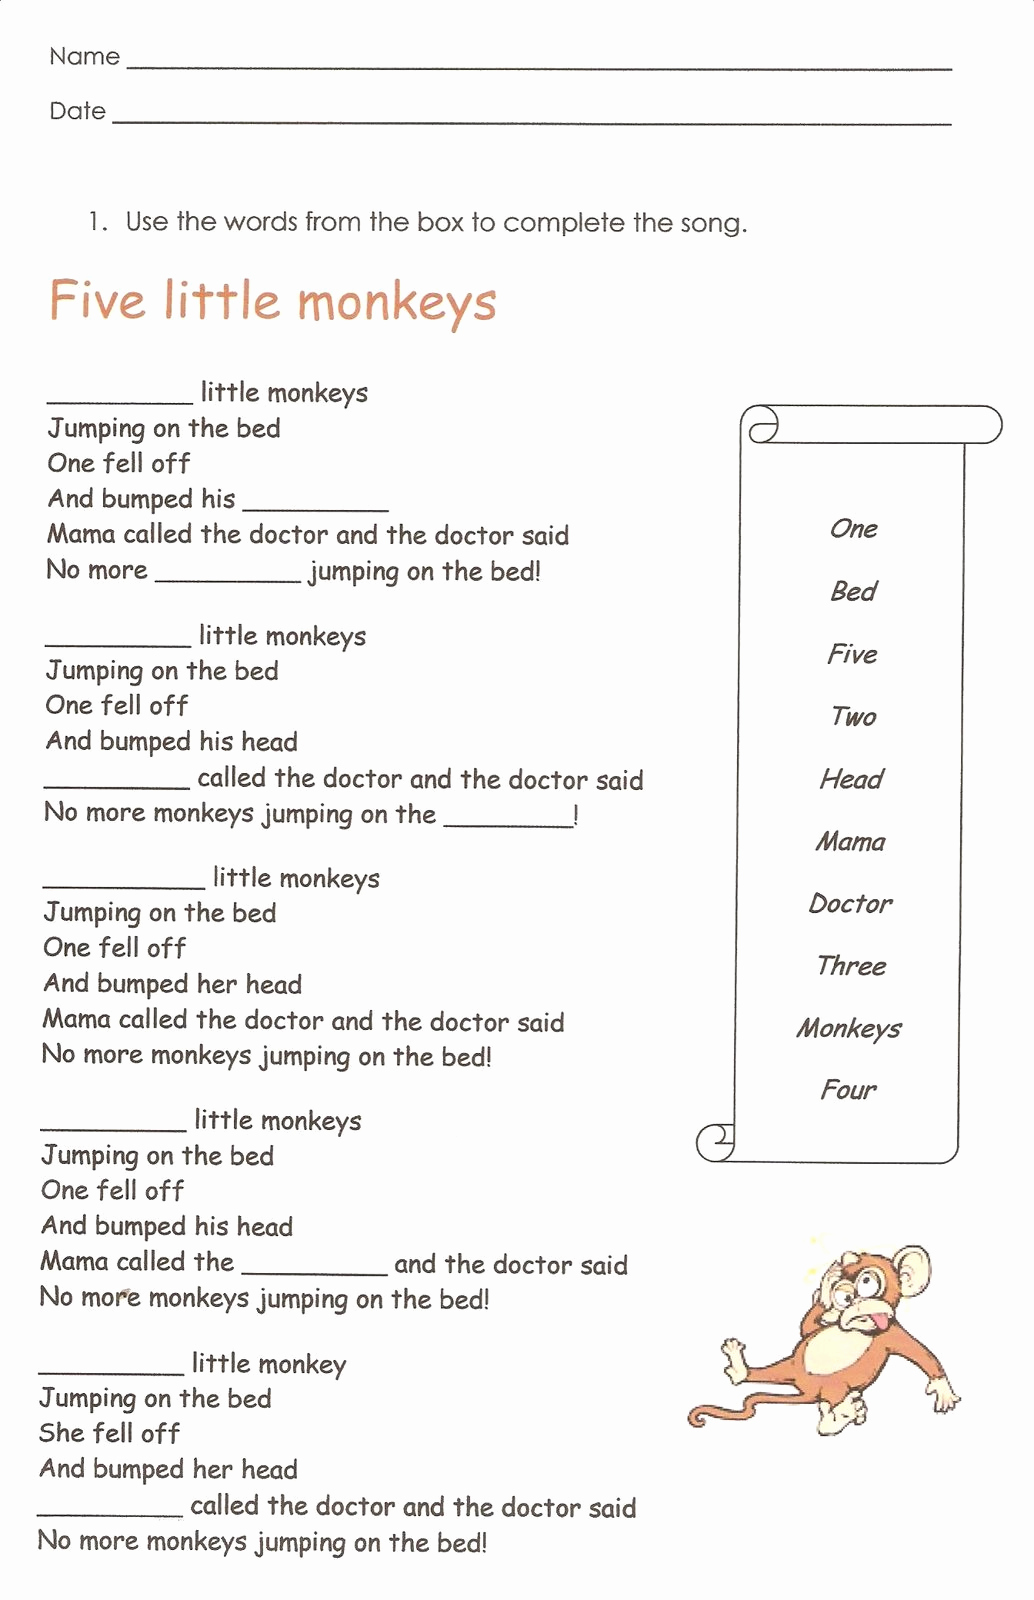 Grammar Worksheet First Grade Inspirational First Grade English Worksheets to Print